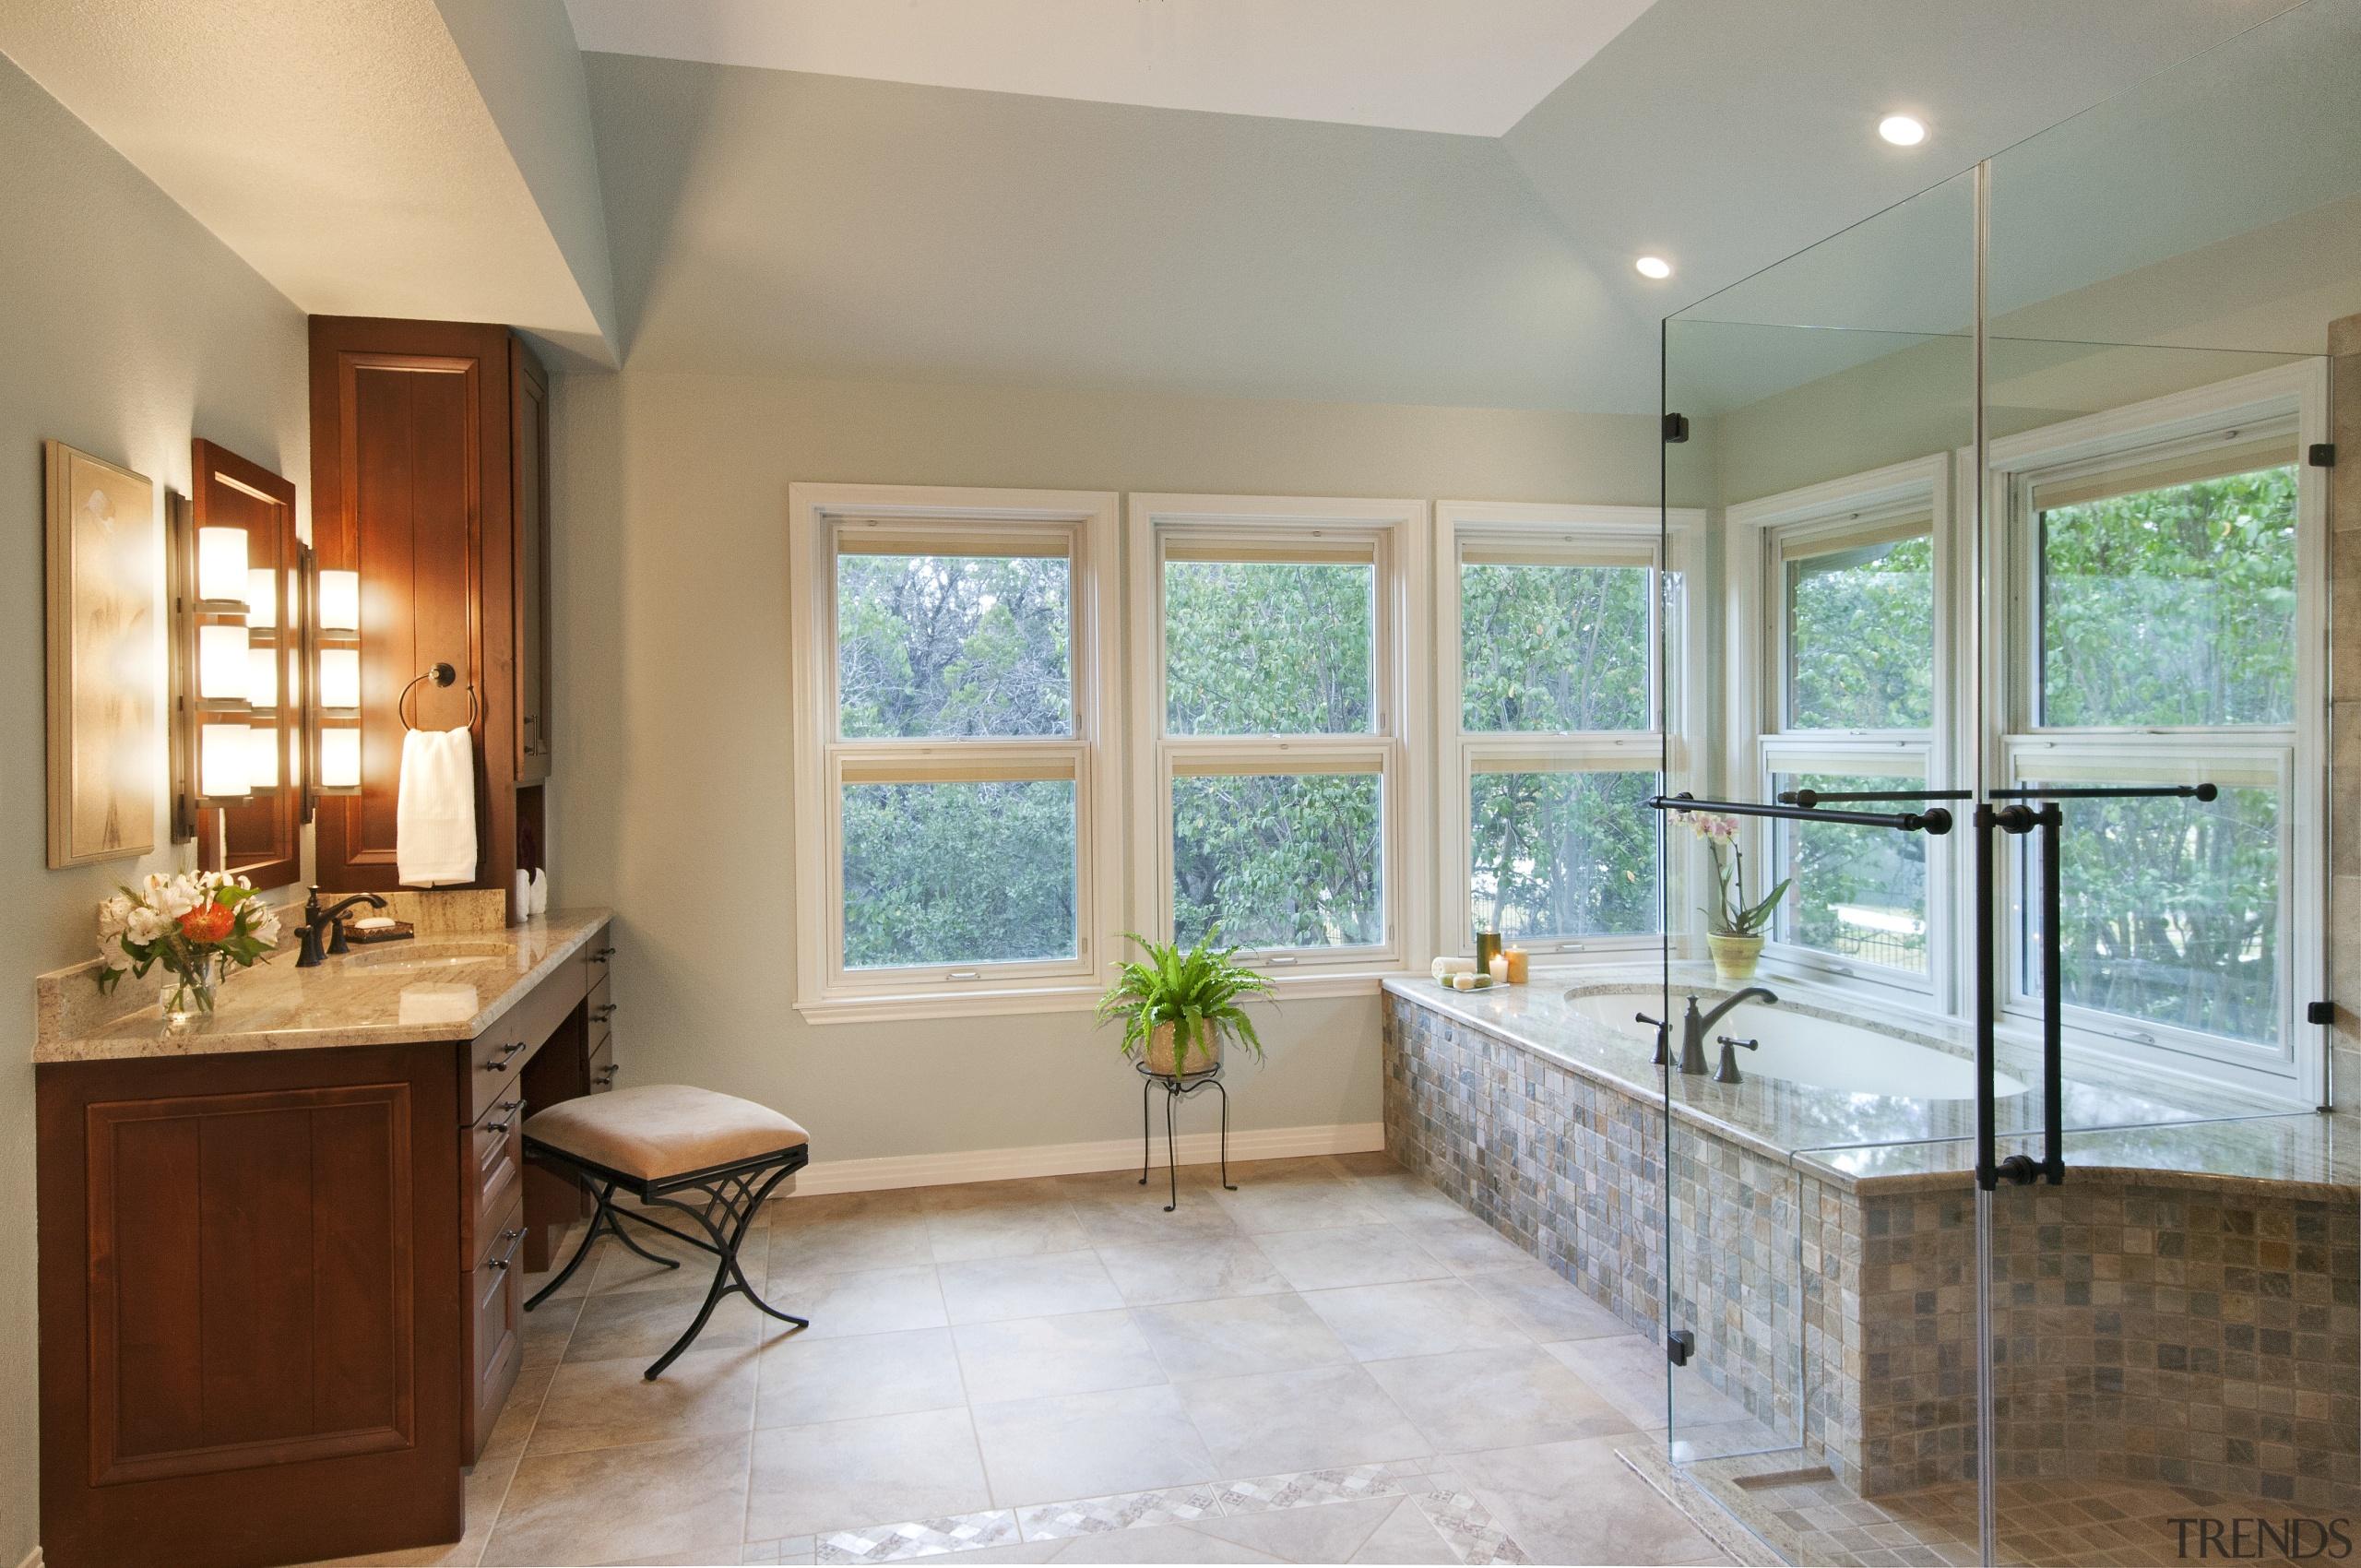 Large corner windows bring in plenty of natural bathroom, ceiling, estate, floor, home, interior design, real estate, room, wall, window, gray